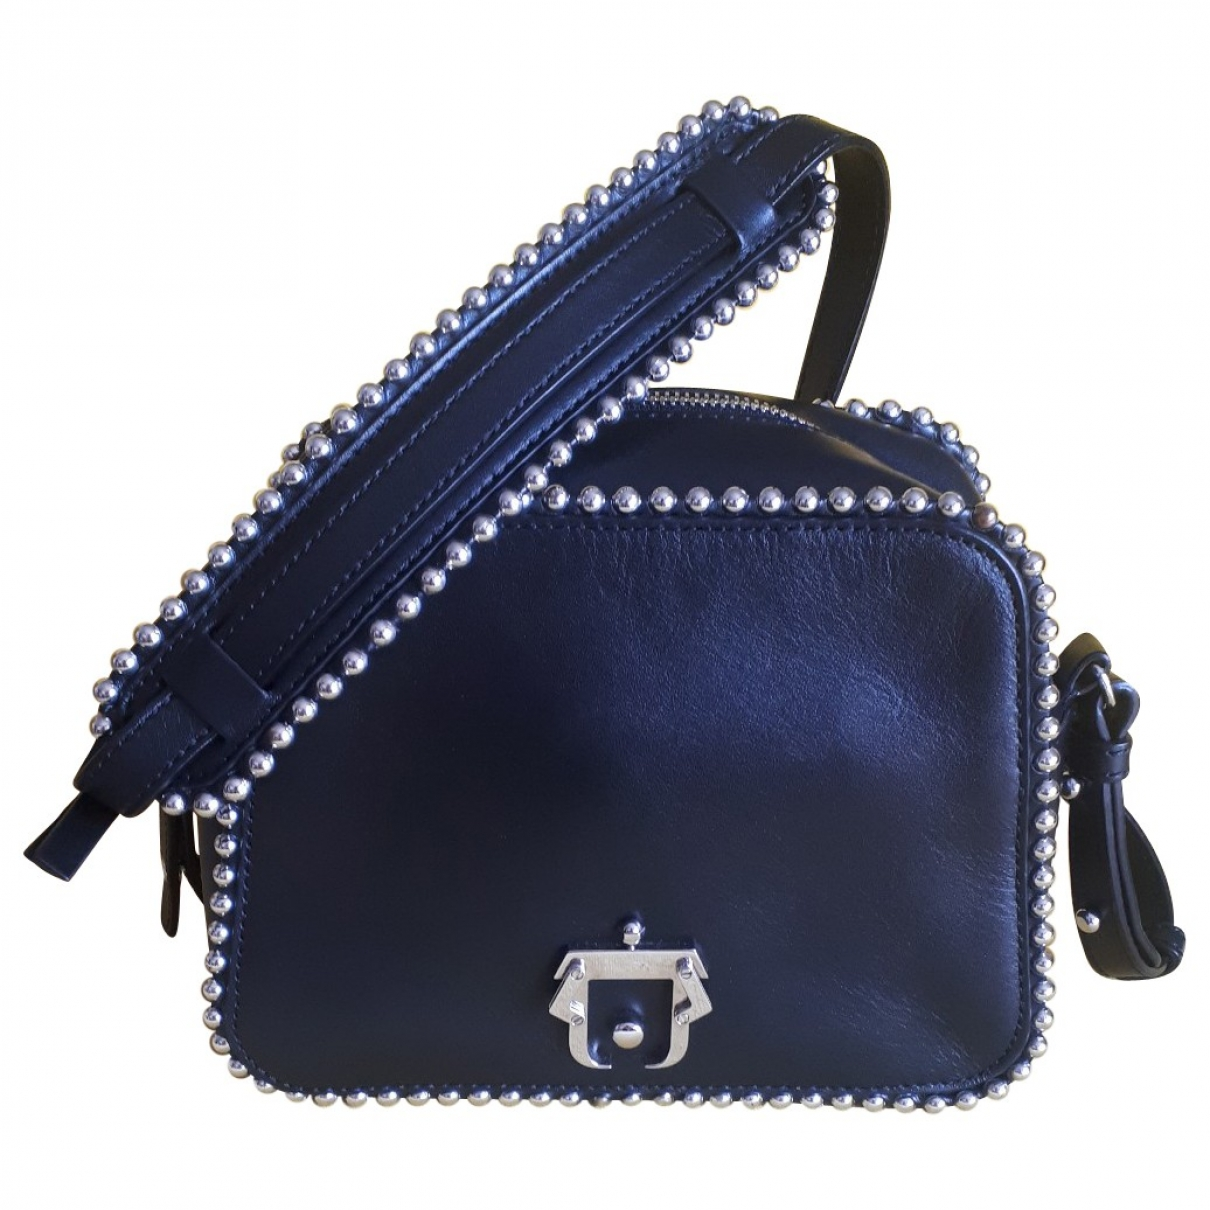 Paula Cademartori \N Handtasche in  Schwarz Leder